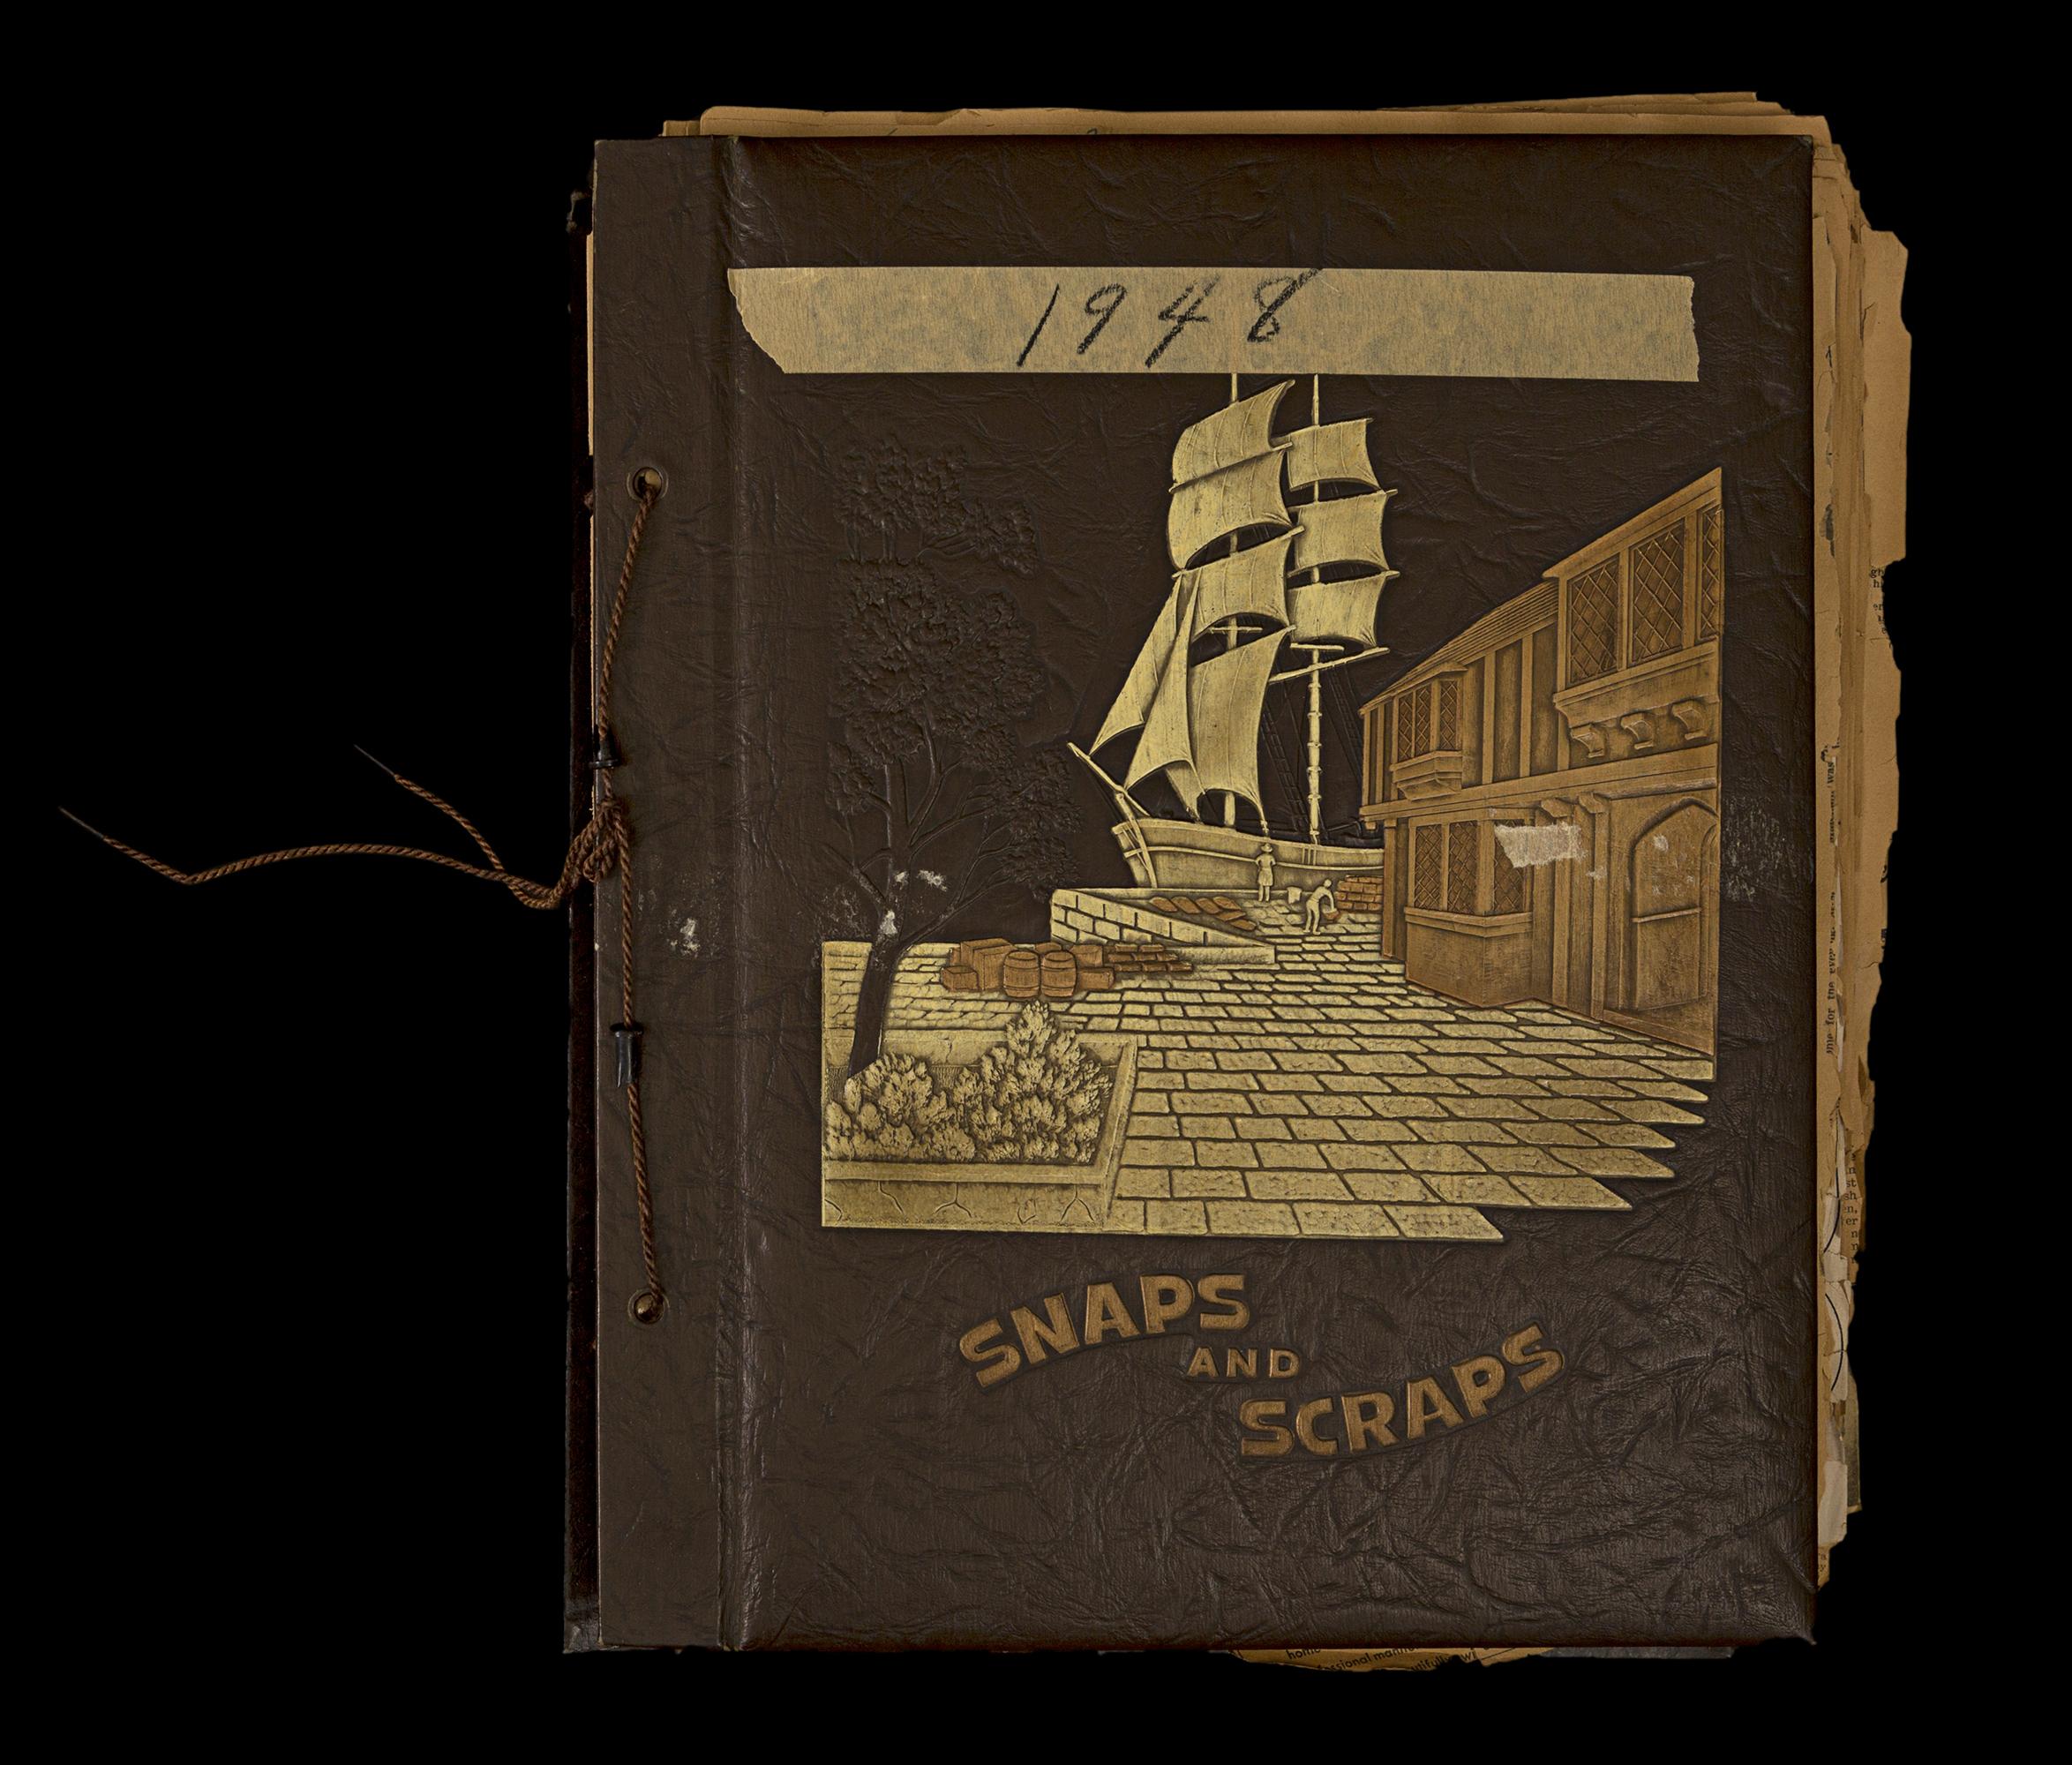 HBScrapbook_2_Cover_B0706_1948.jpg